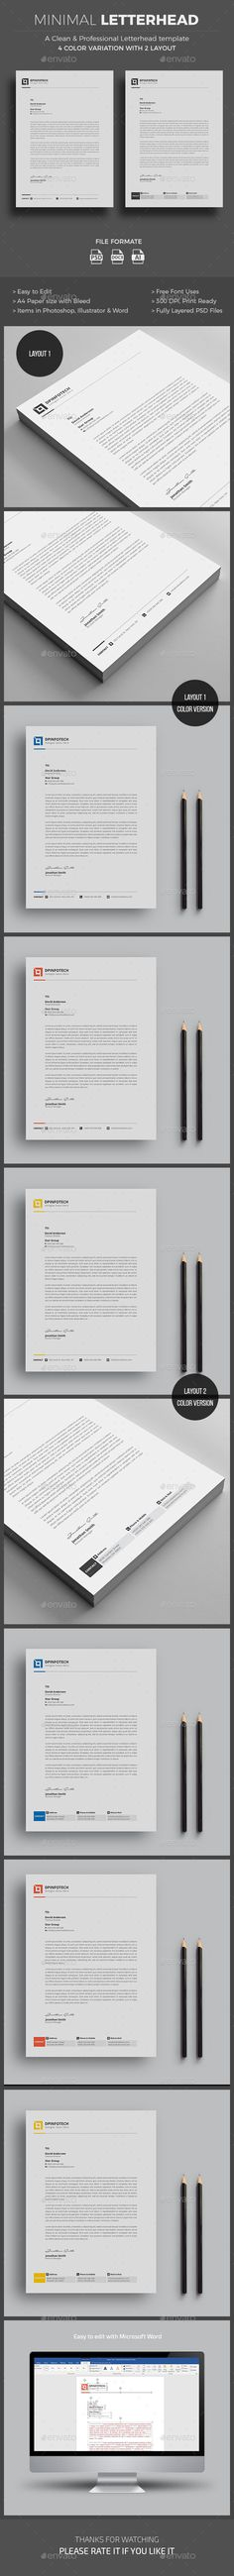 #Letterhead - Stationery Print Templates Download here:    https://graphicriver.net/item/letterhead/20324093?ref=alena994